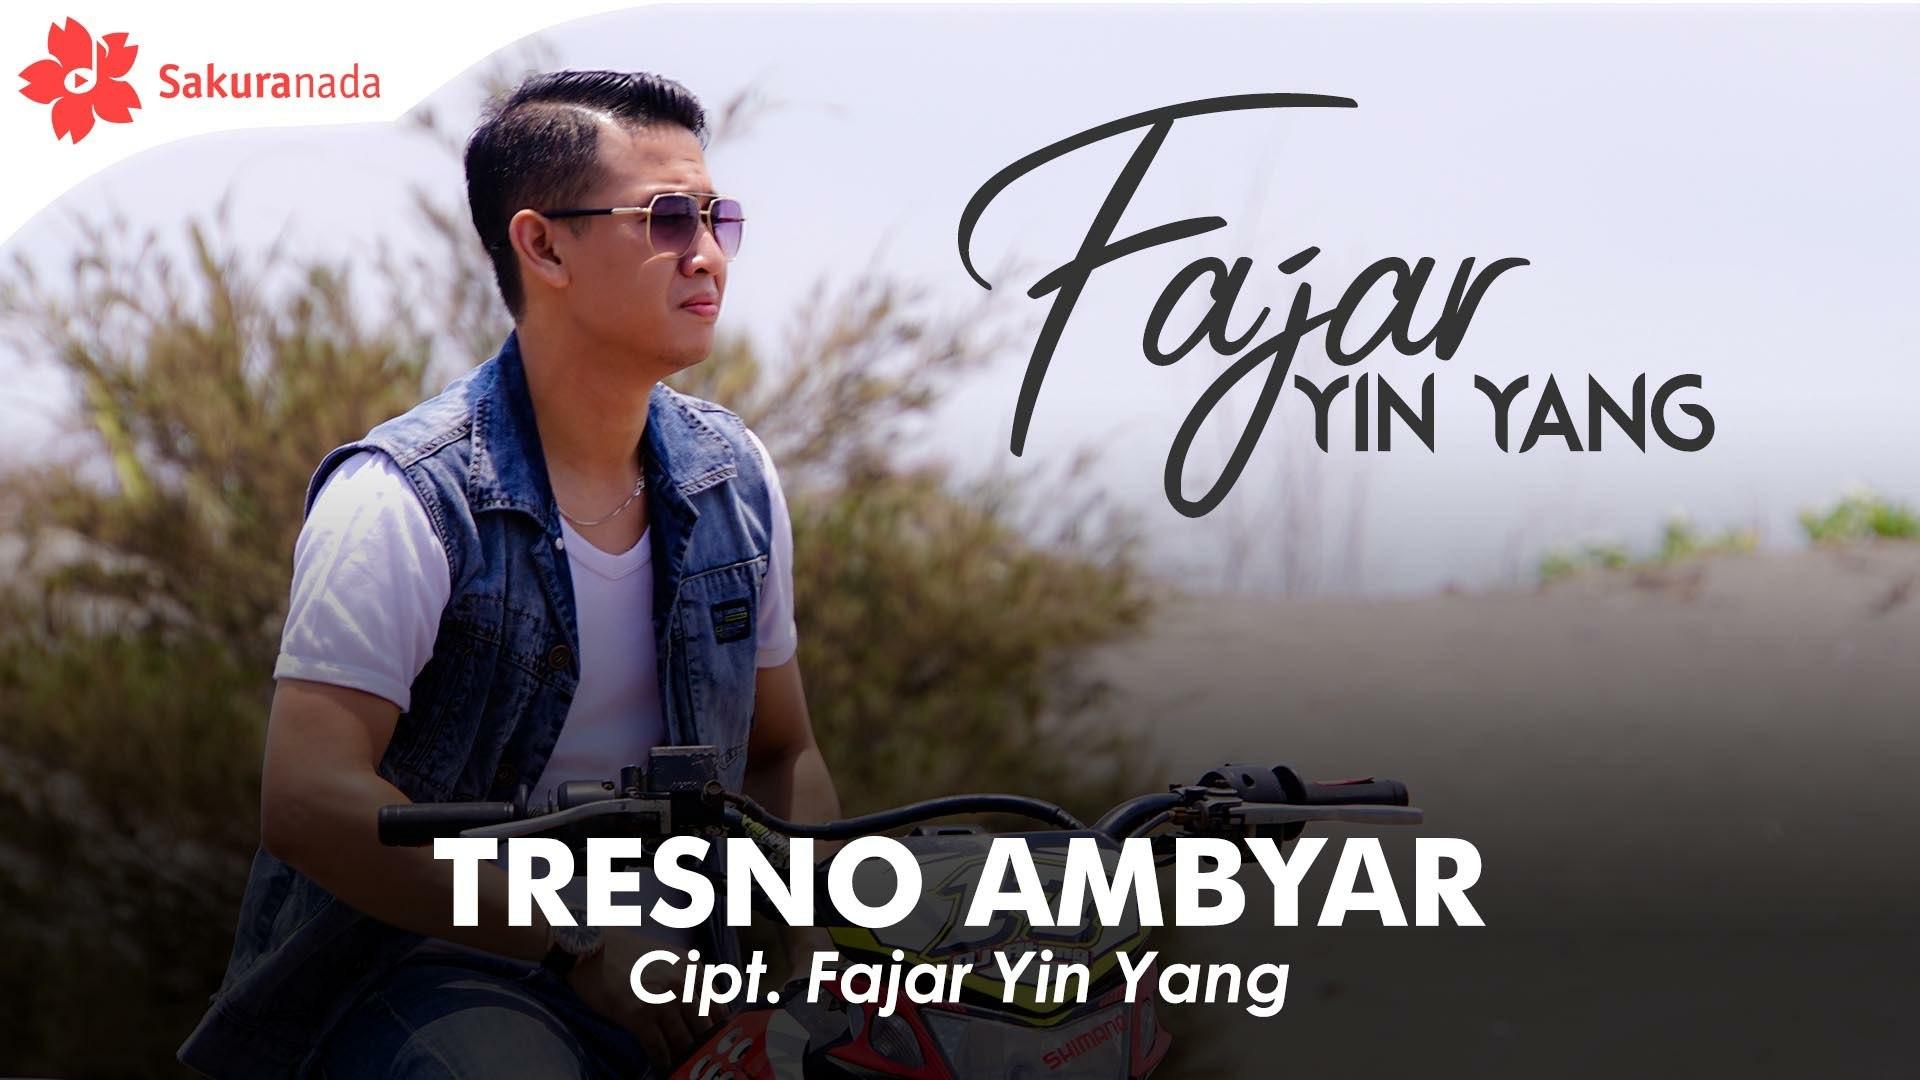 Fajar Yin Yang Tresno Ambyar Official M V Video Dailymotion